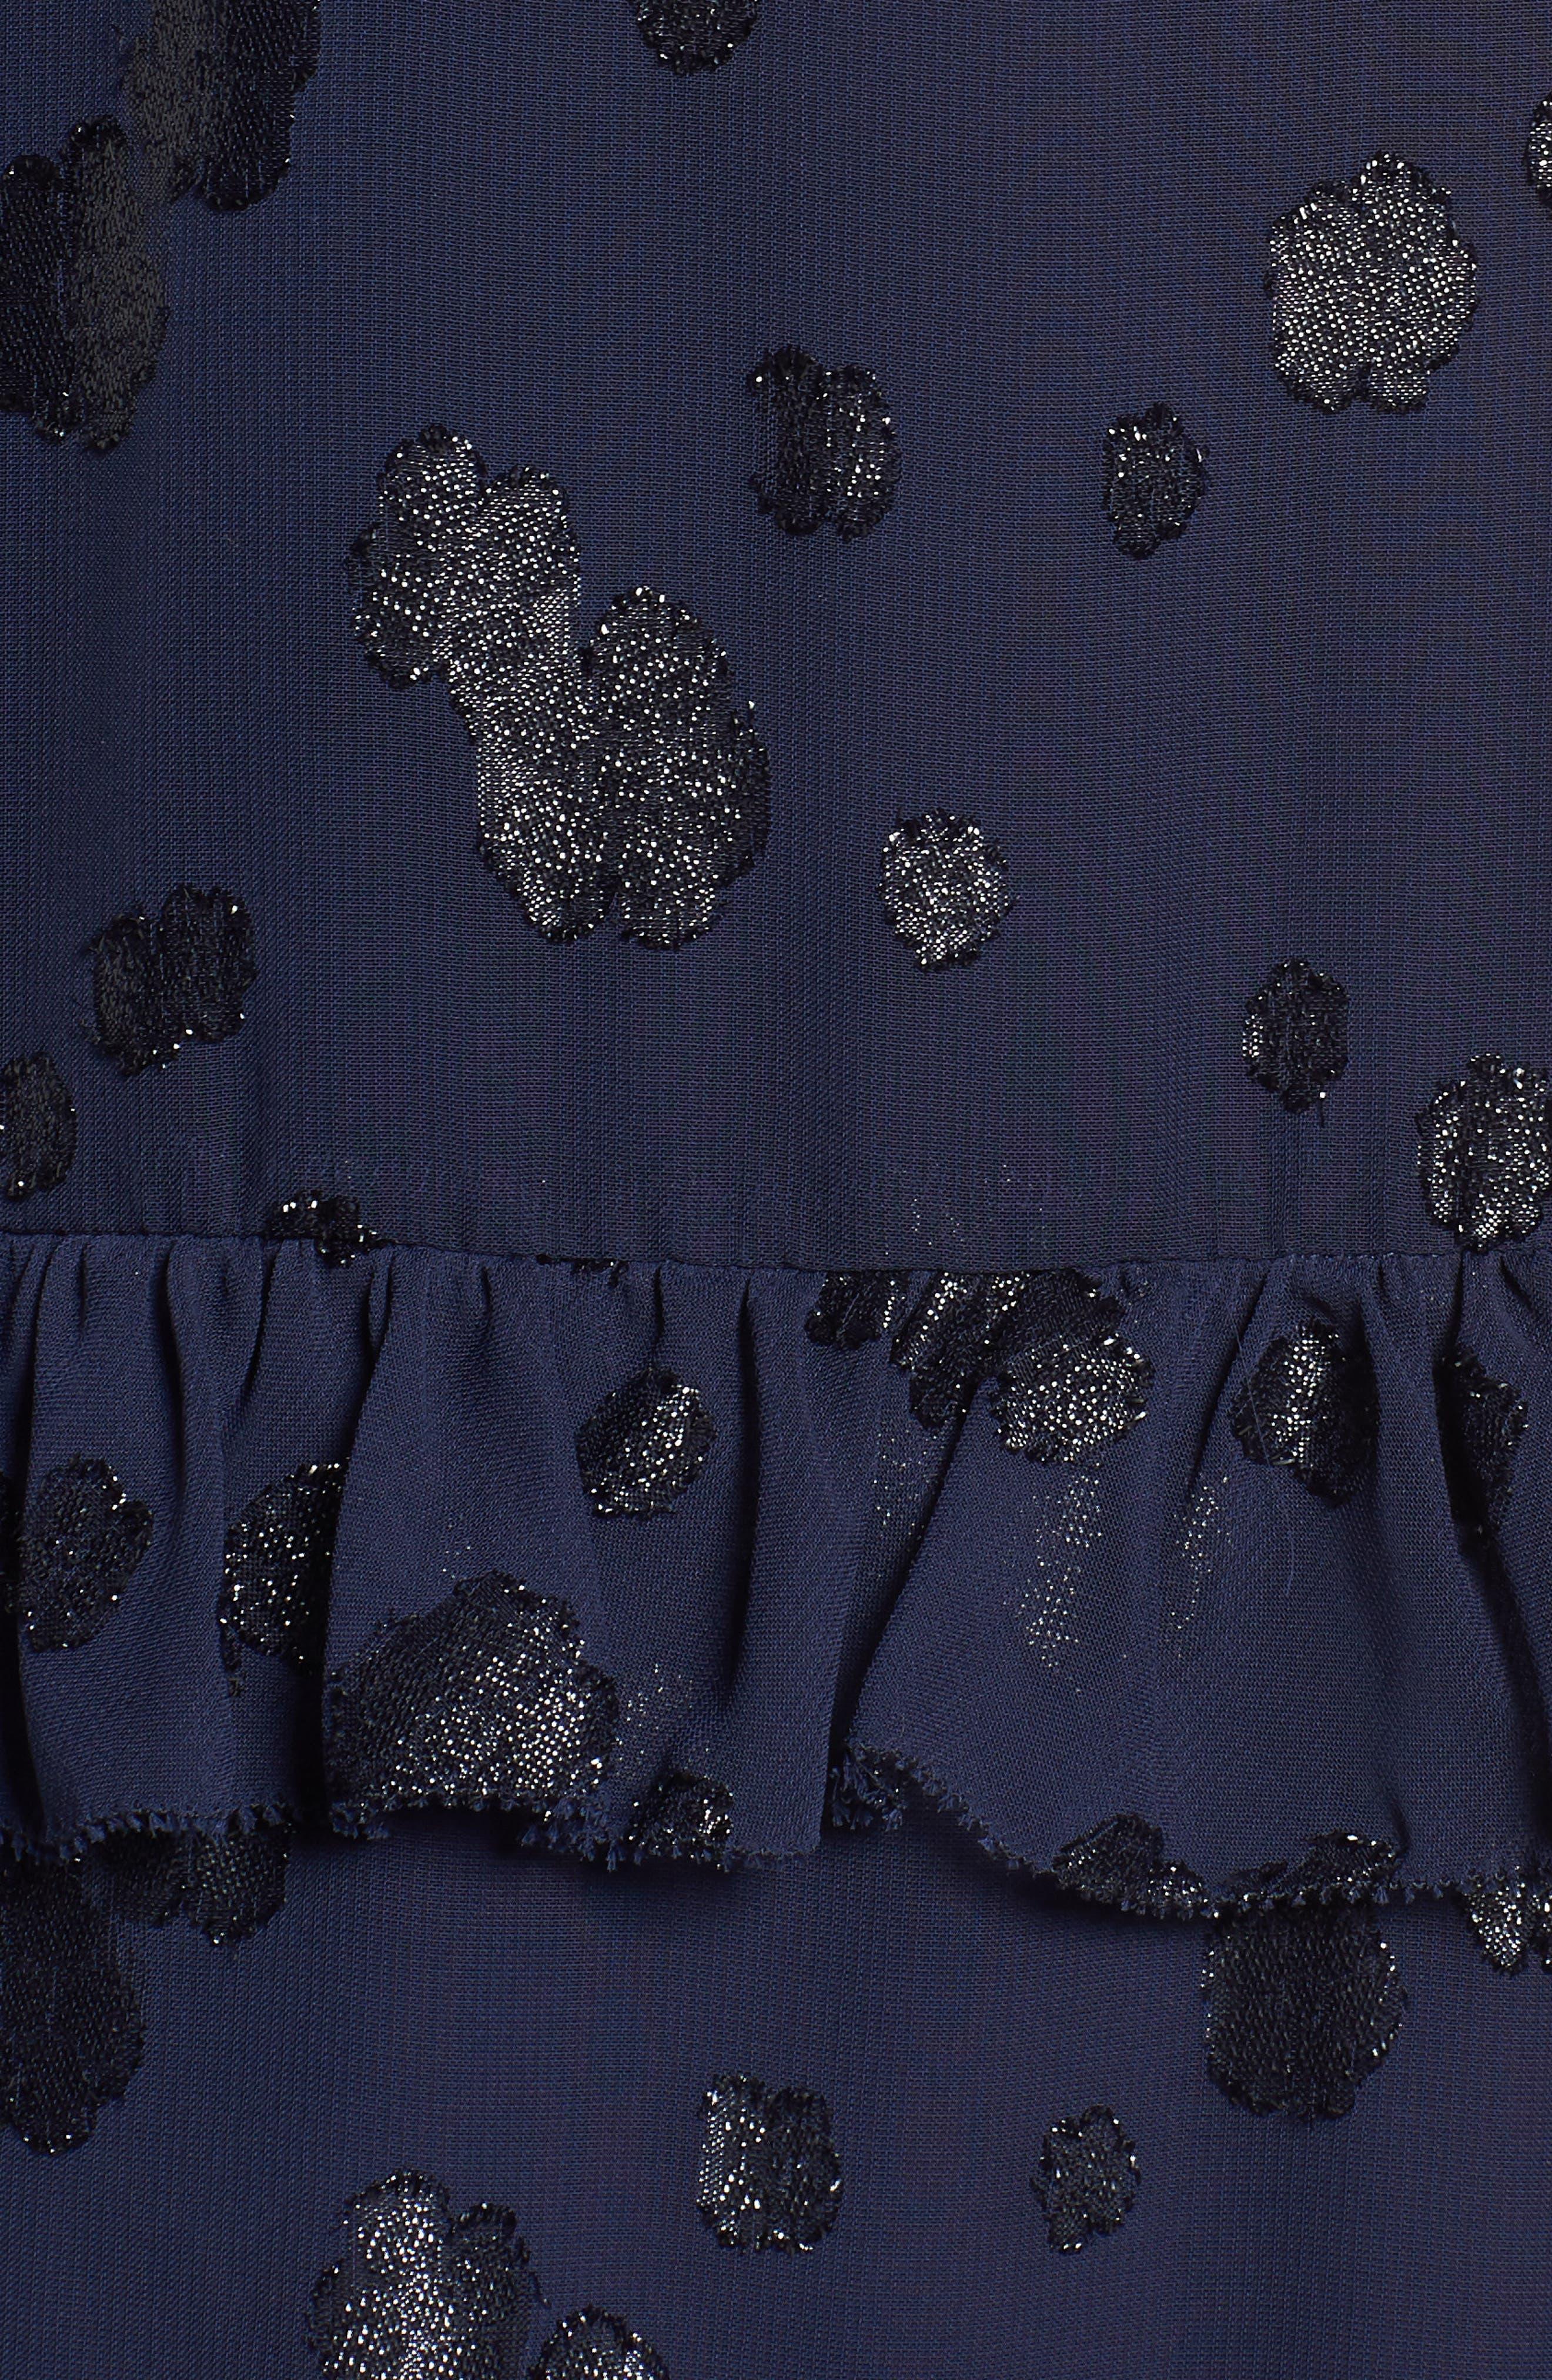 Tiered Ruffle Dress,                             Alternate thumbnail 5, color,                             True Navy